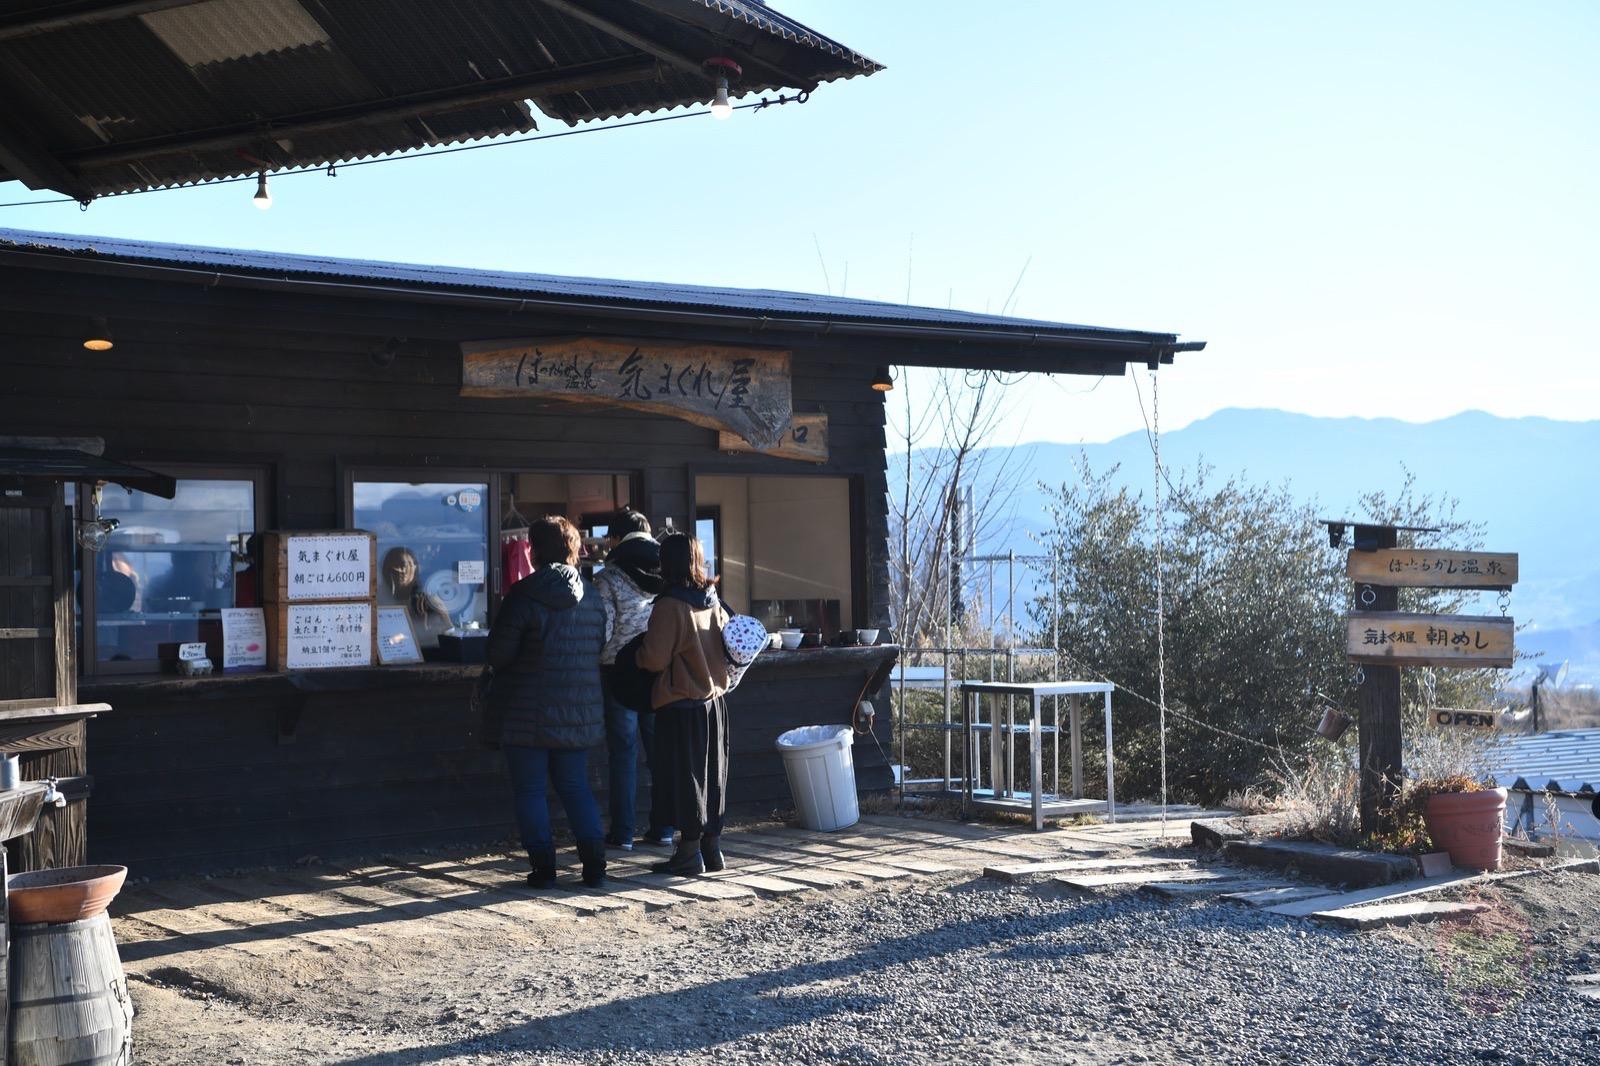 Yamanashi Hottarakashi Onsen JTC21 37